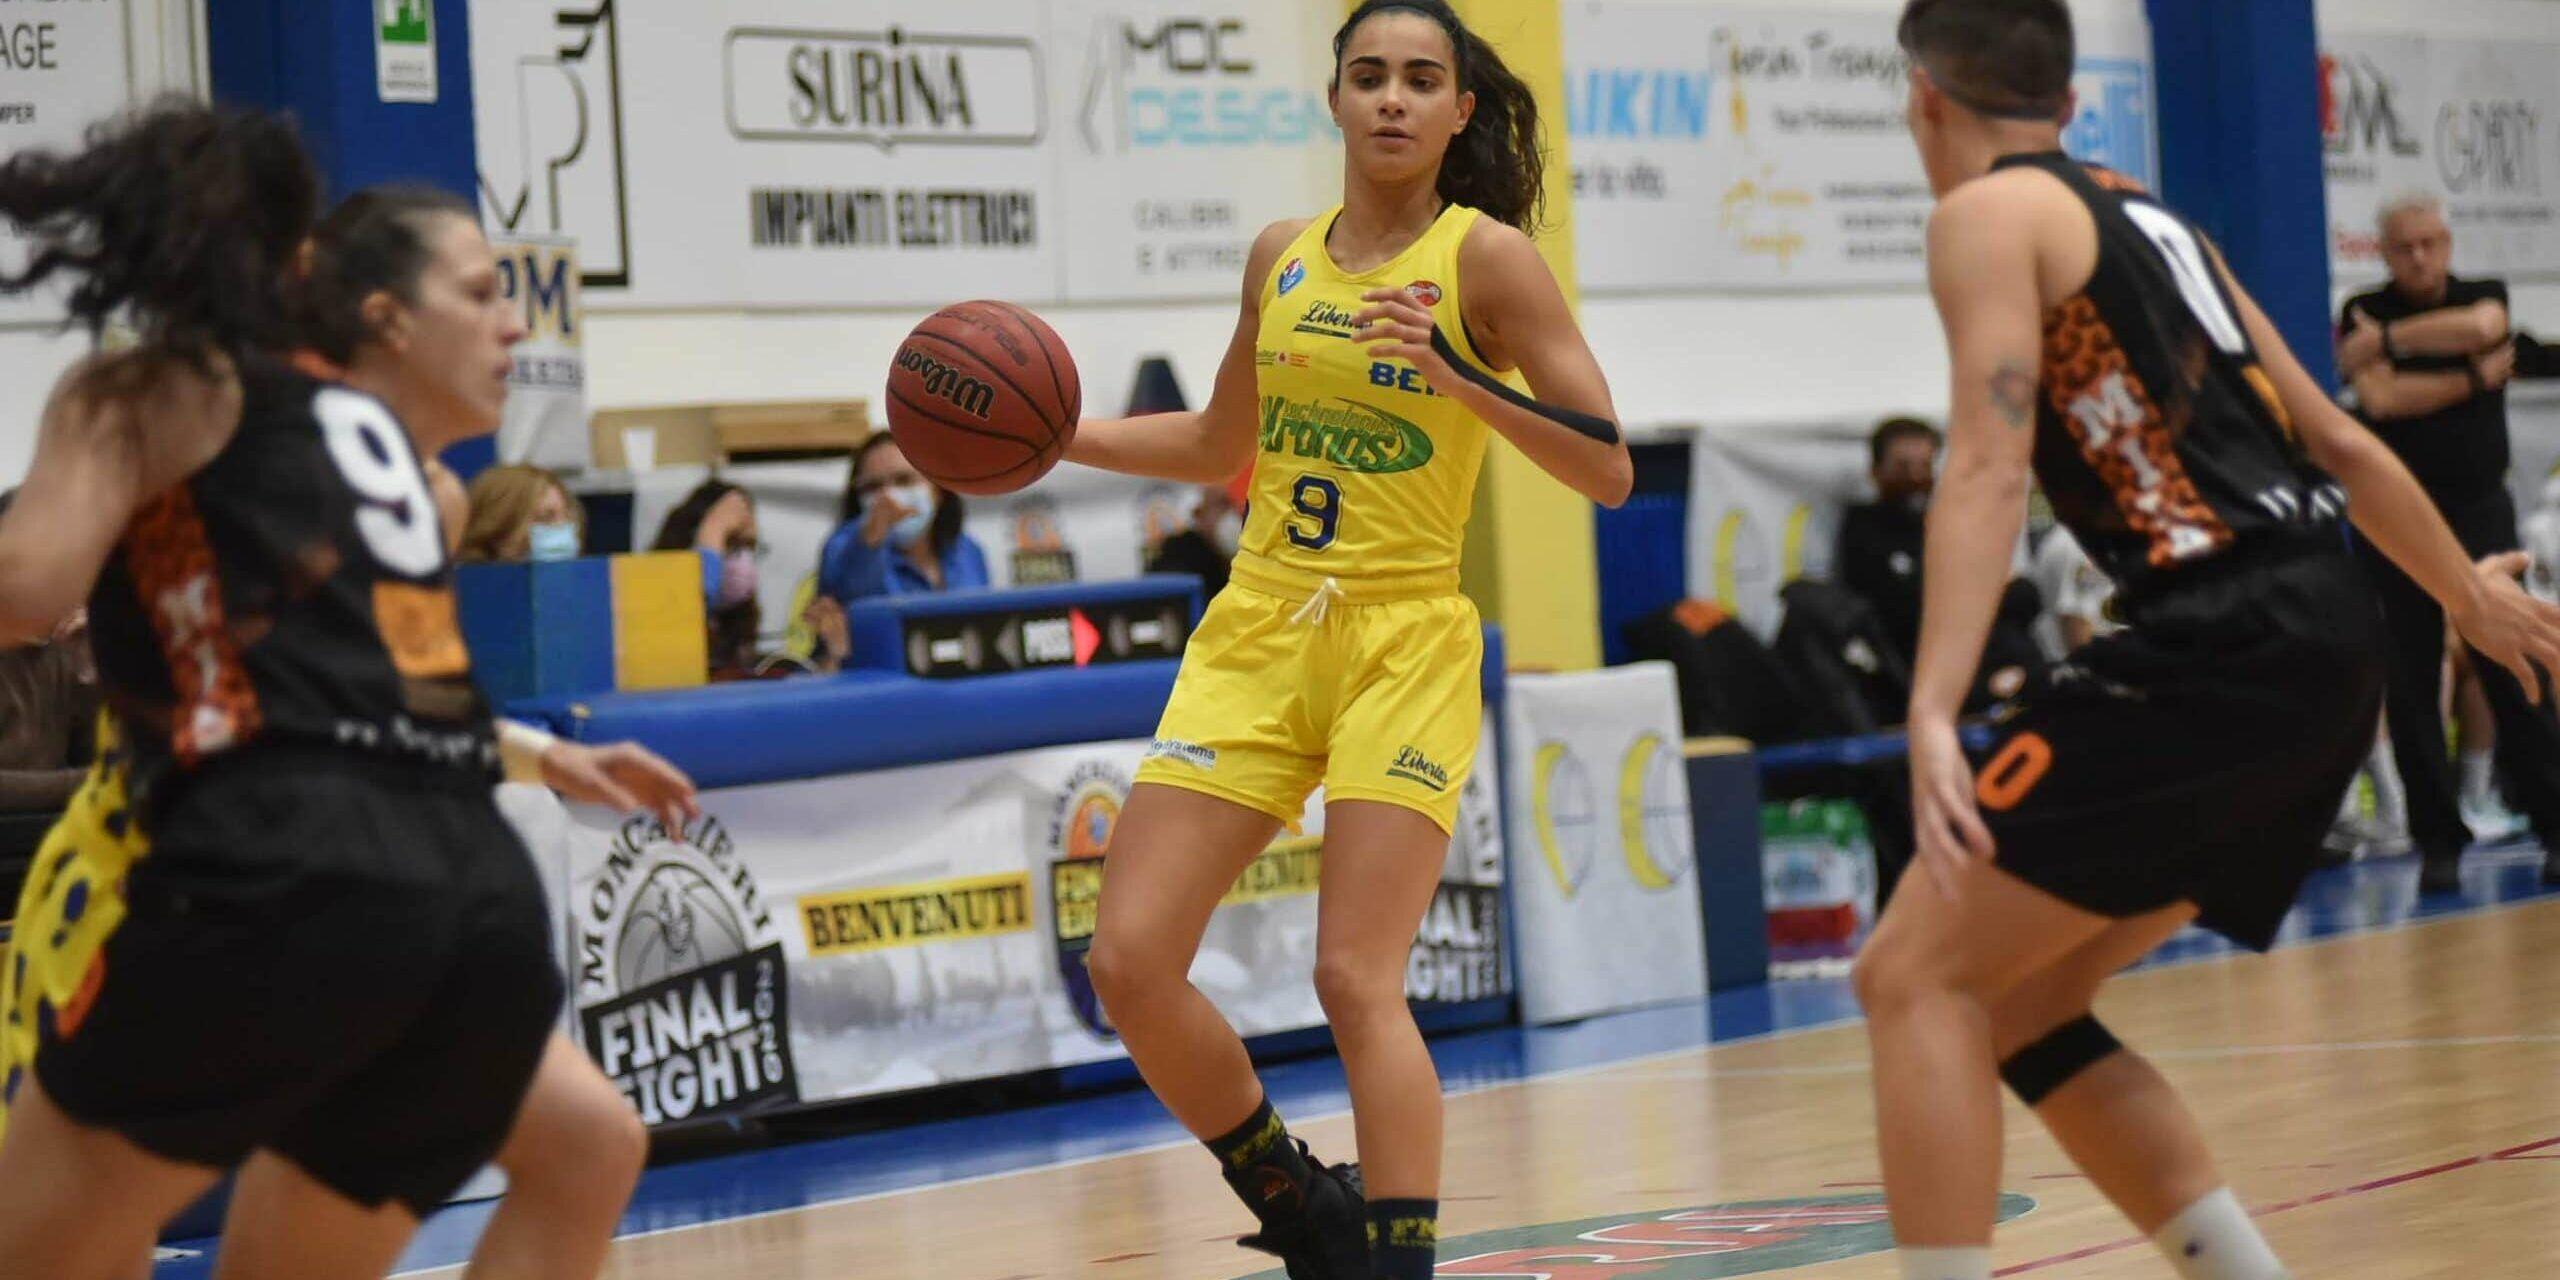 MONCALIERI - Sport, gara uno finale play off basket femminile: la Akronos batte Milano